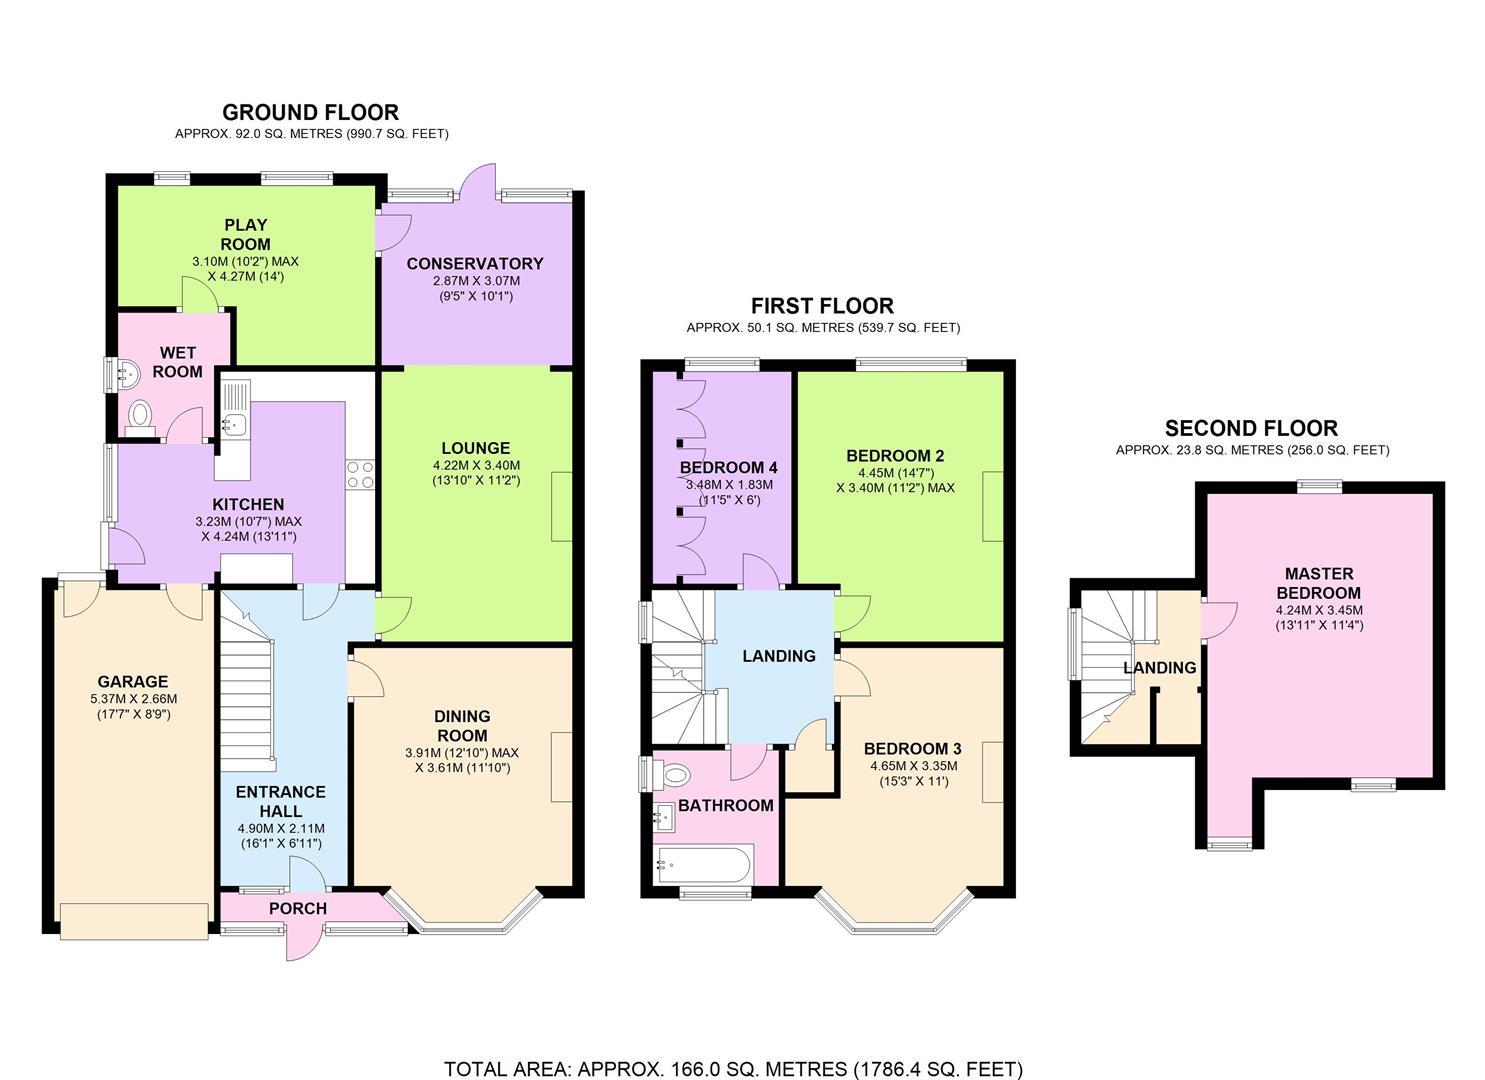 125 Albert Road Epsom floorplan.jpg